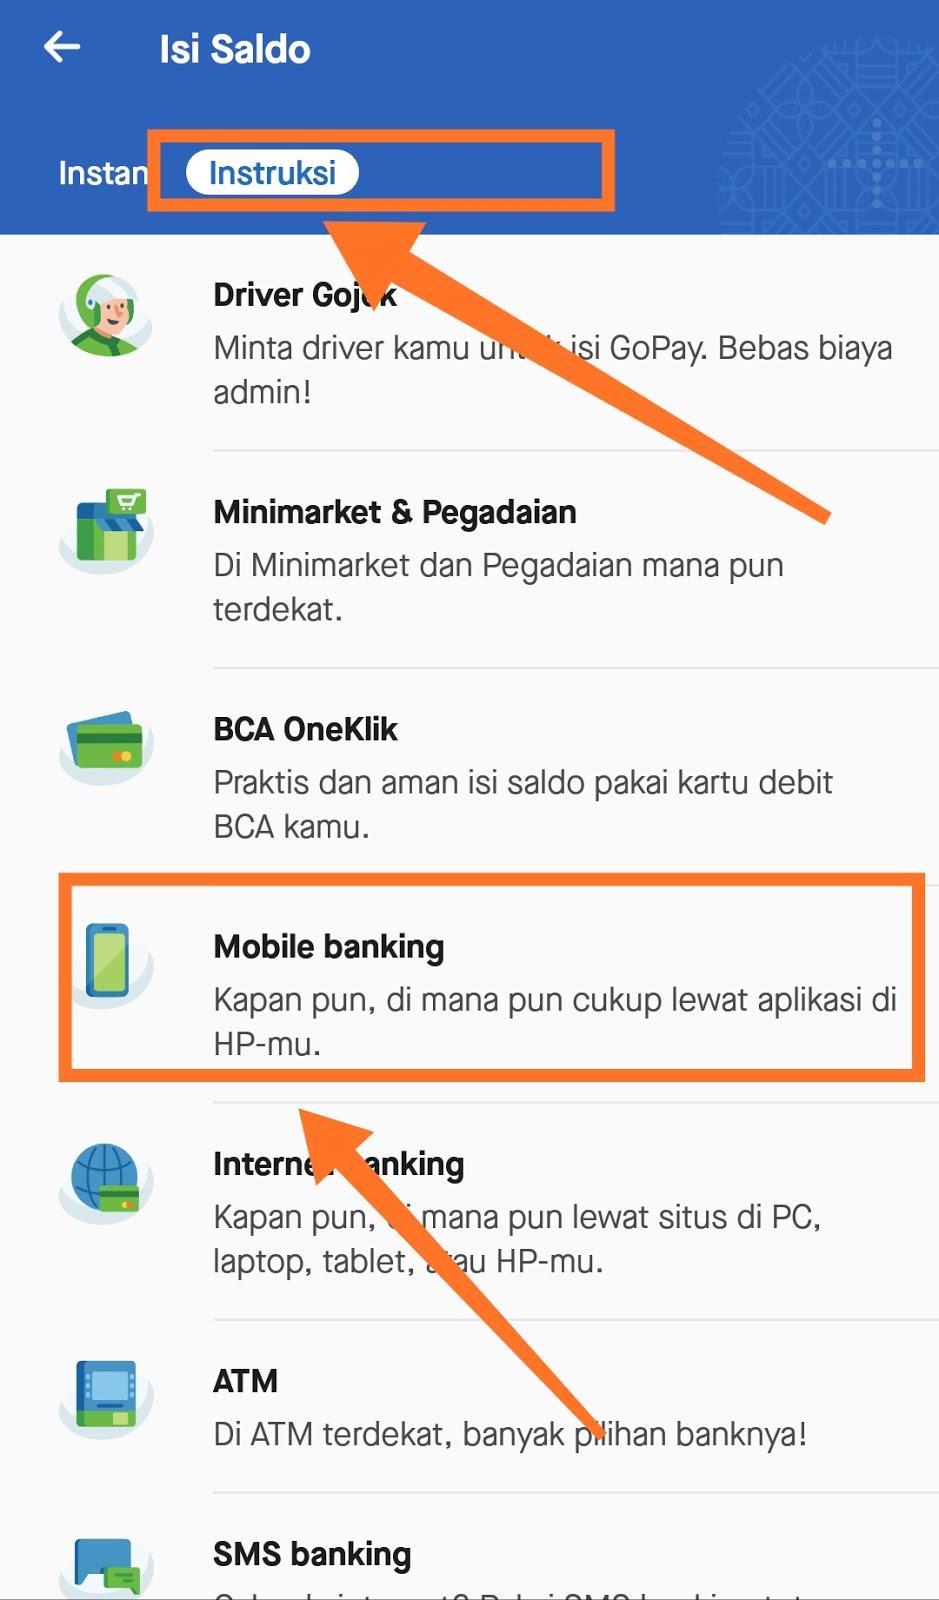 Begini Cara Topup Go Pay Customer Pada Aplikasi Go Jek Menggunakan Aplikasi Mandiri Online